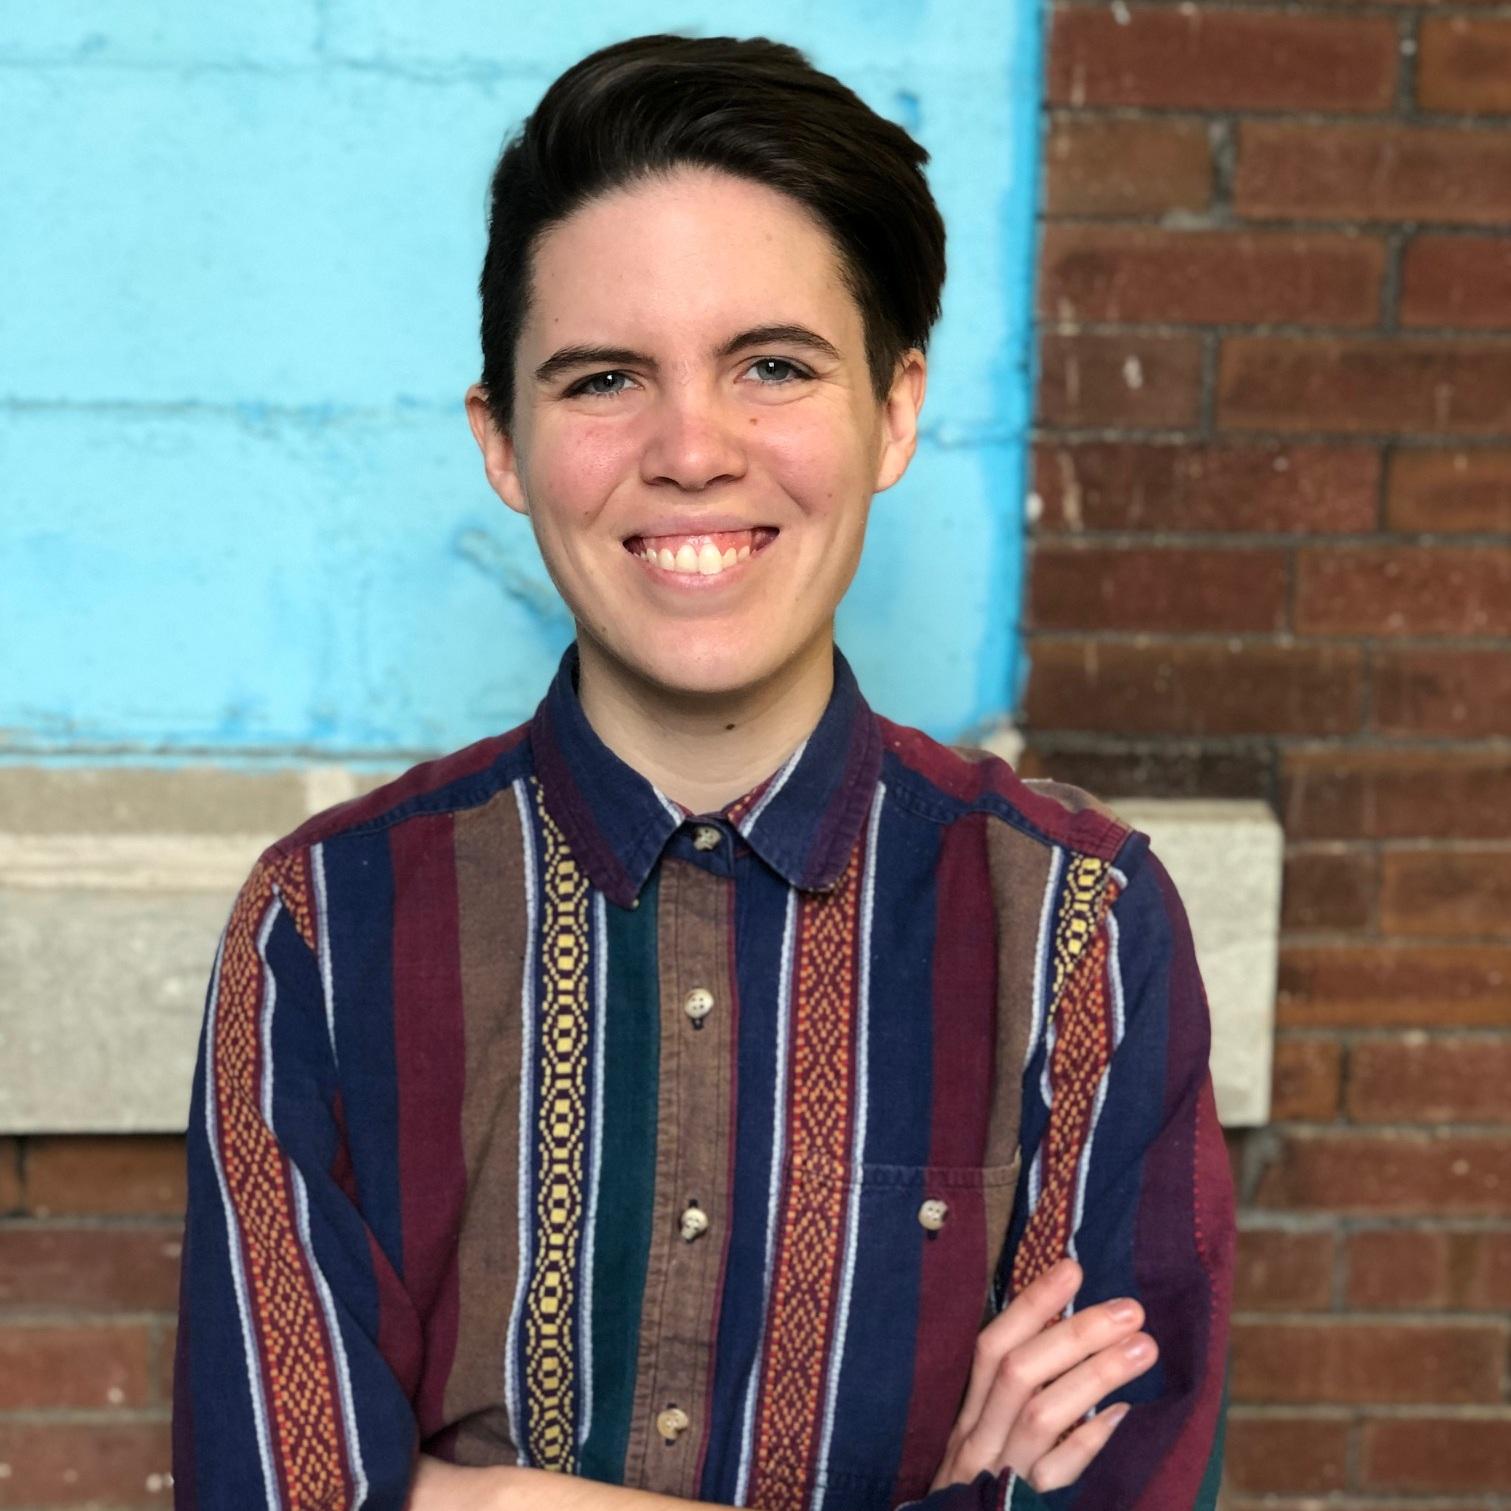 Beth Watkins - Program ManagerEmail: beth@irwpSTL.orgExtension: 103